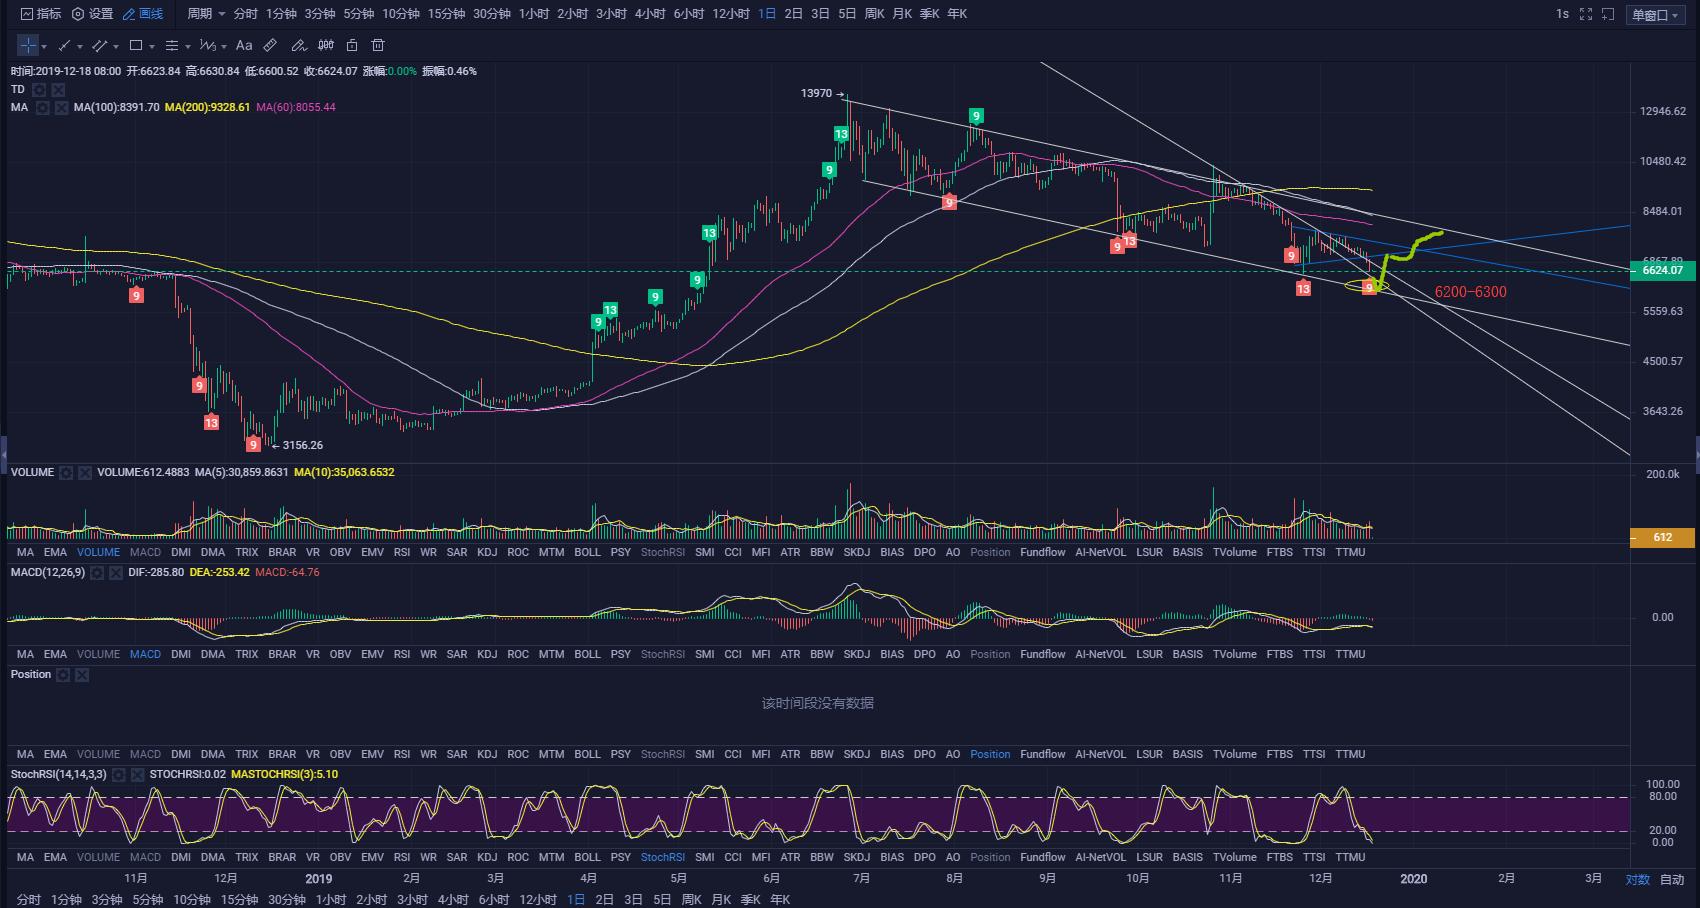 Bitcoin trend analysis